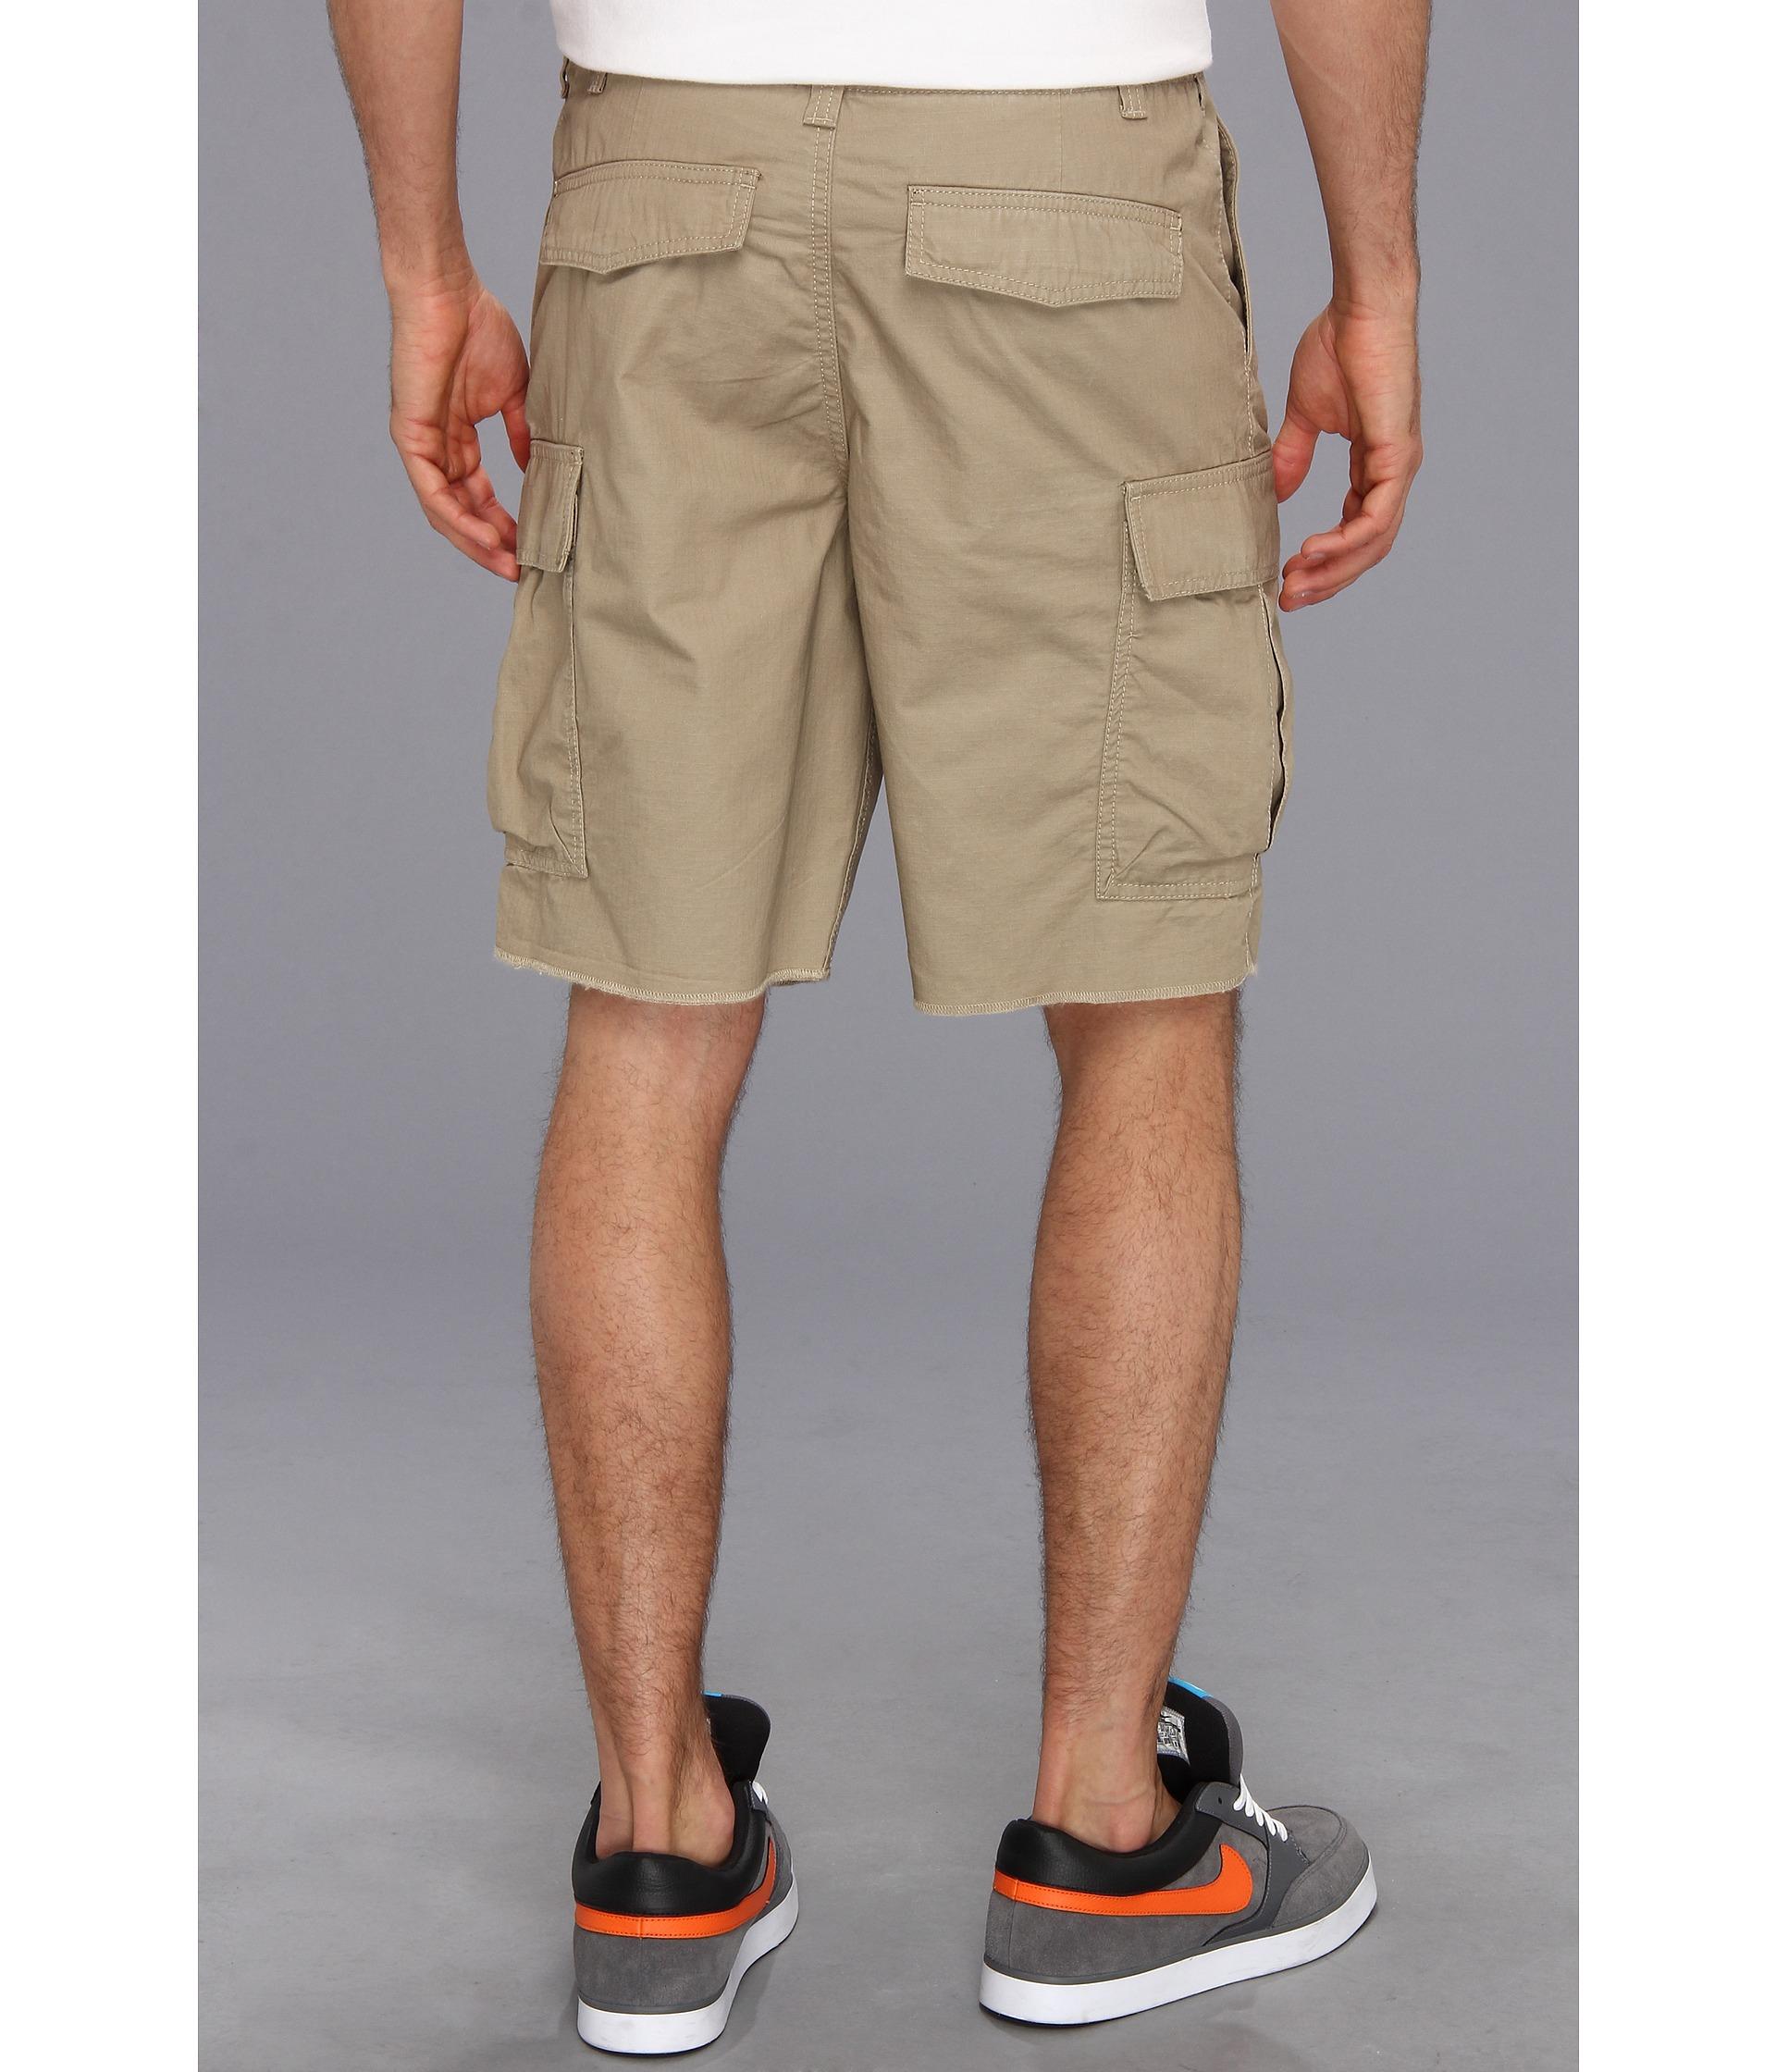 nike 6.0 mens cargo shorts